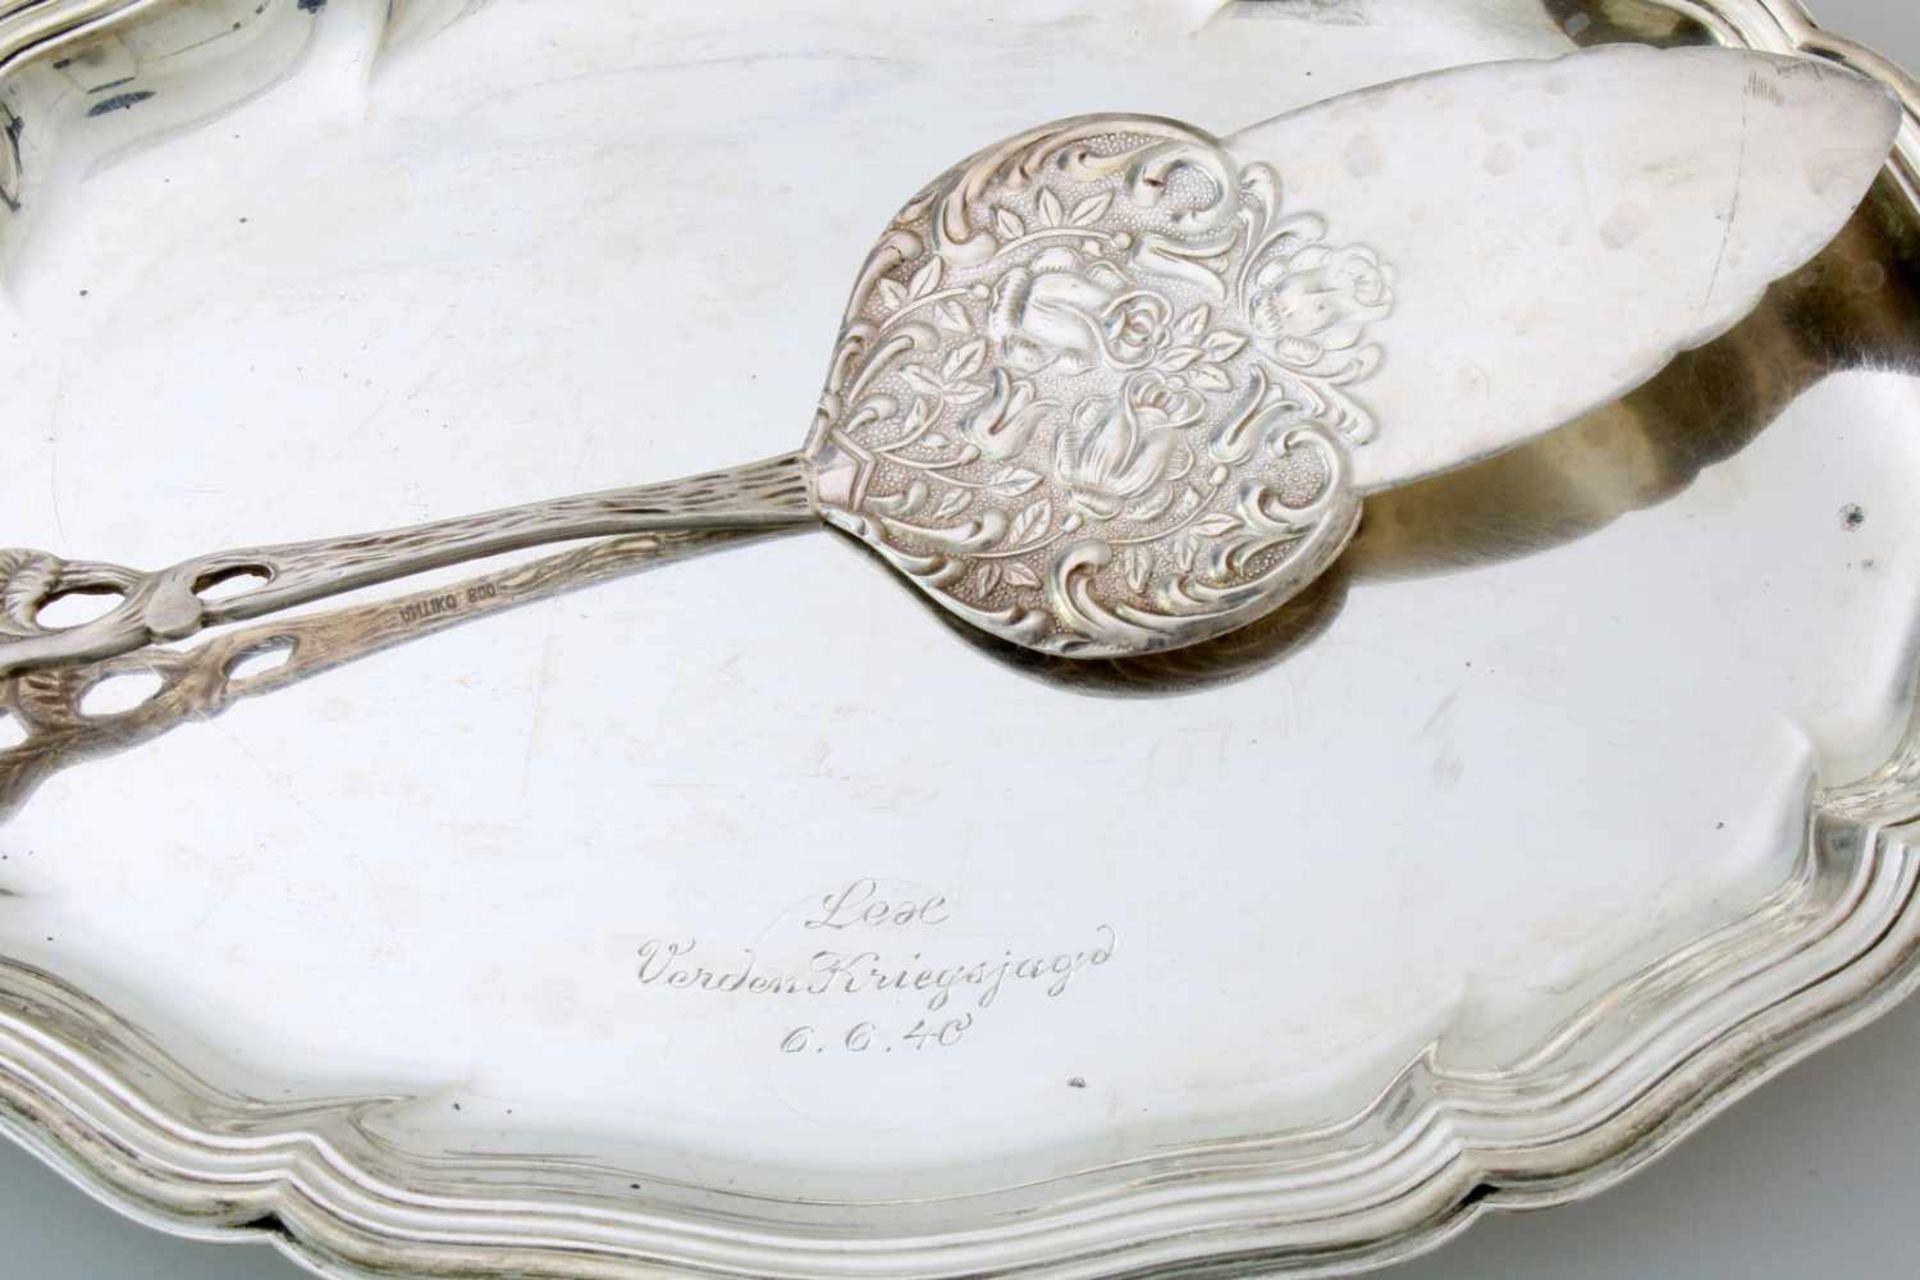 "Silbertablett und 5 Teile SilberTablett 830er Silber, graviert ""Lex Verden Kriegsjagd 6.6.40"", - Bild 2 aus 4"